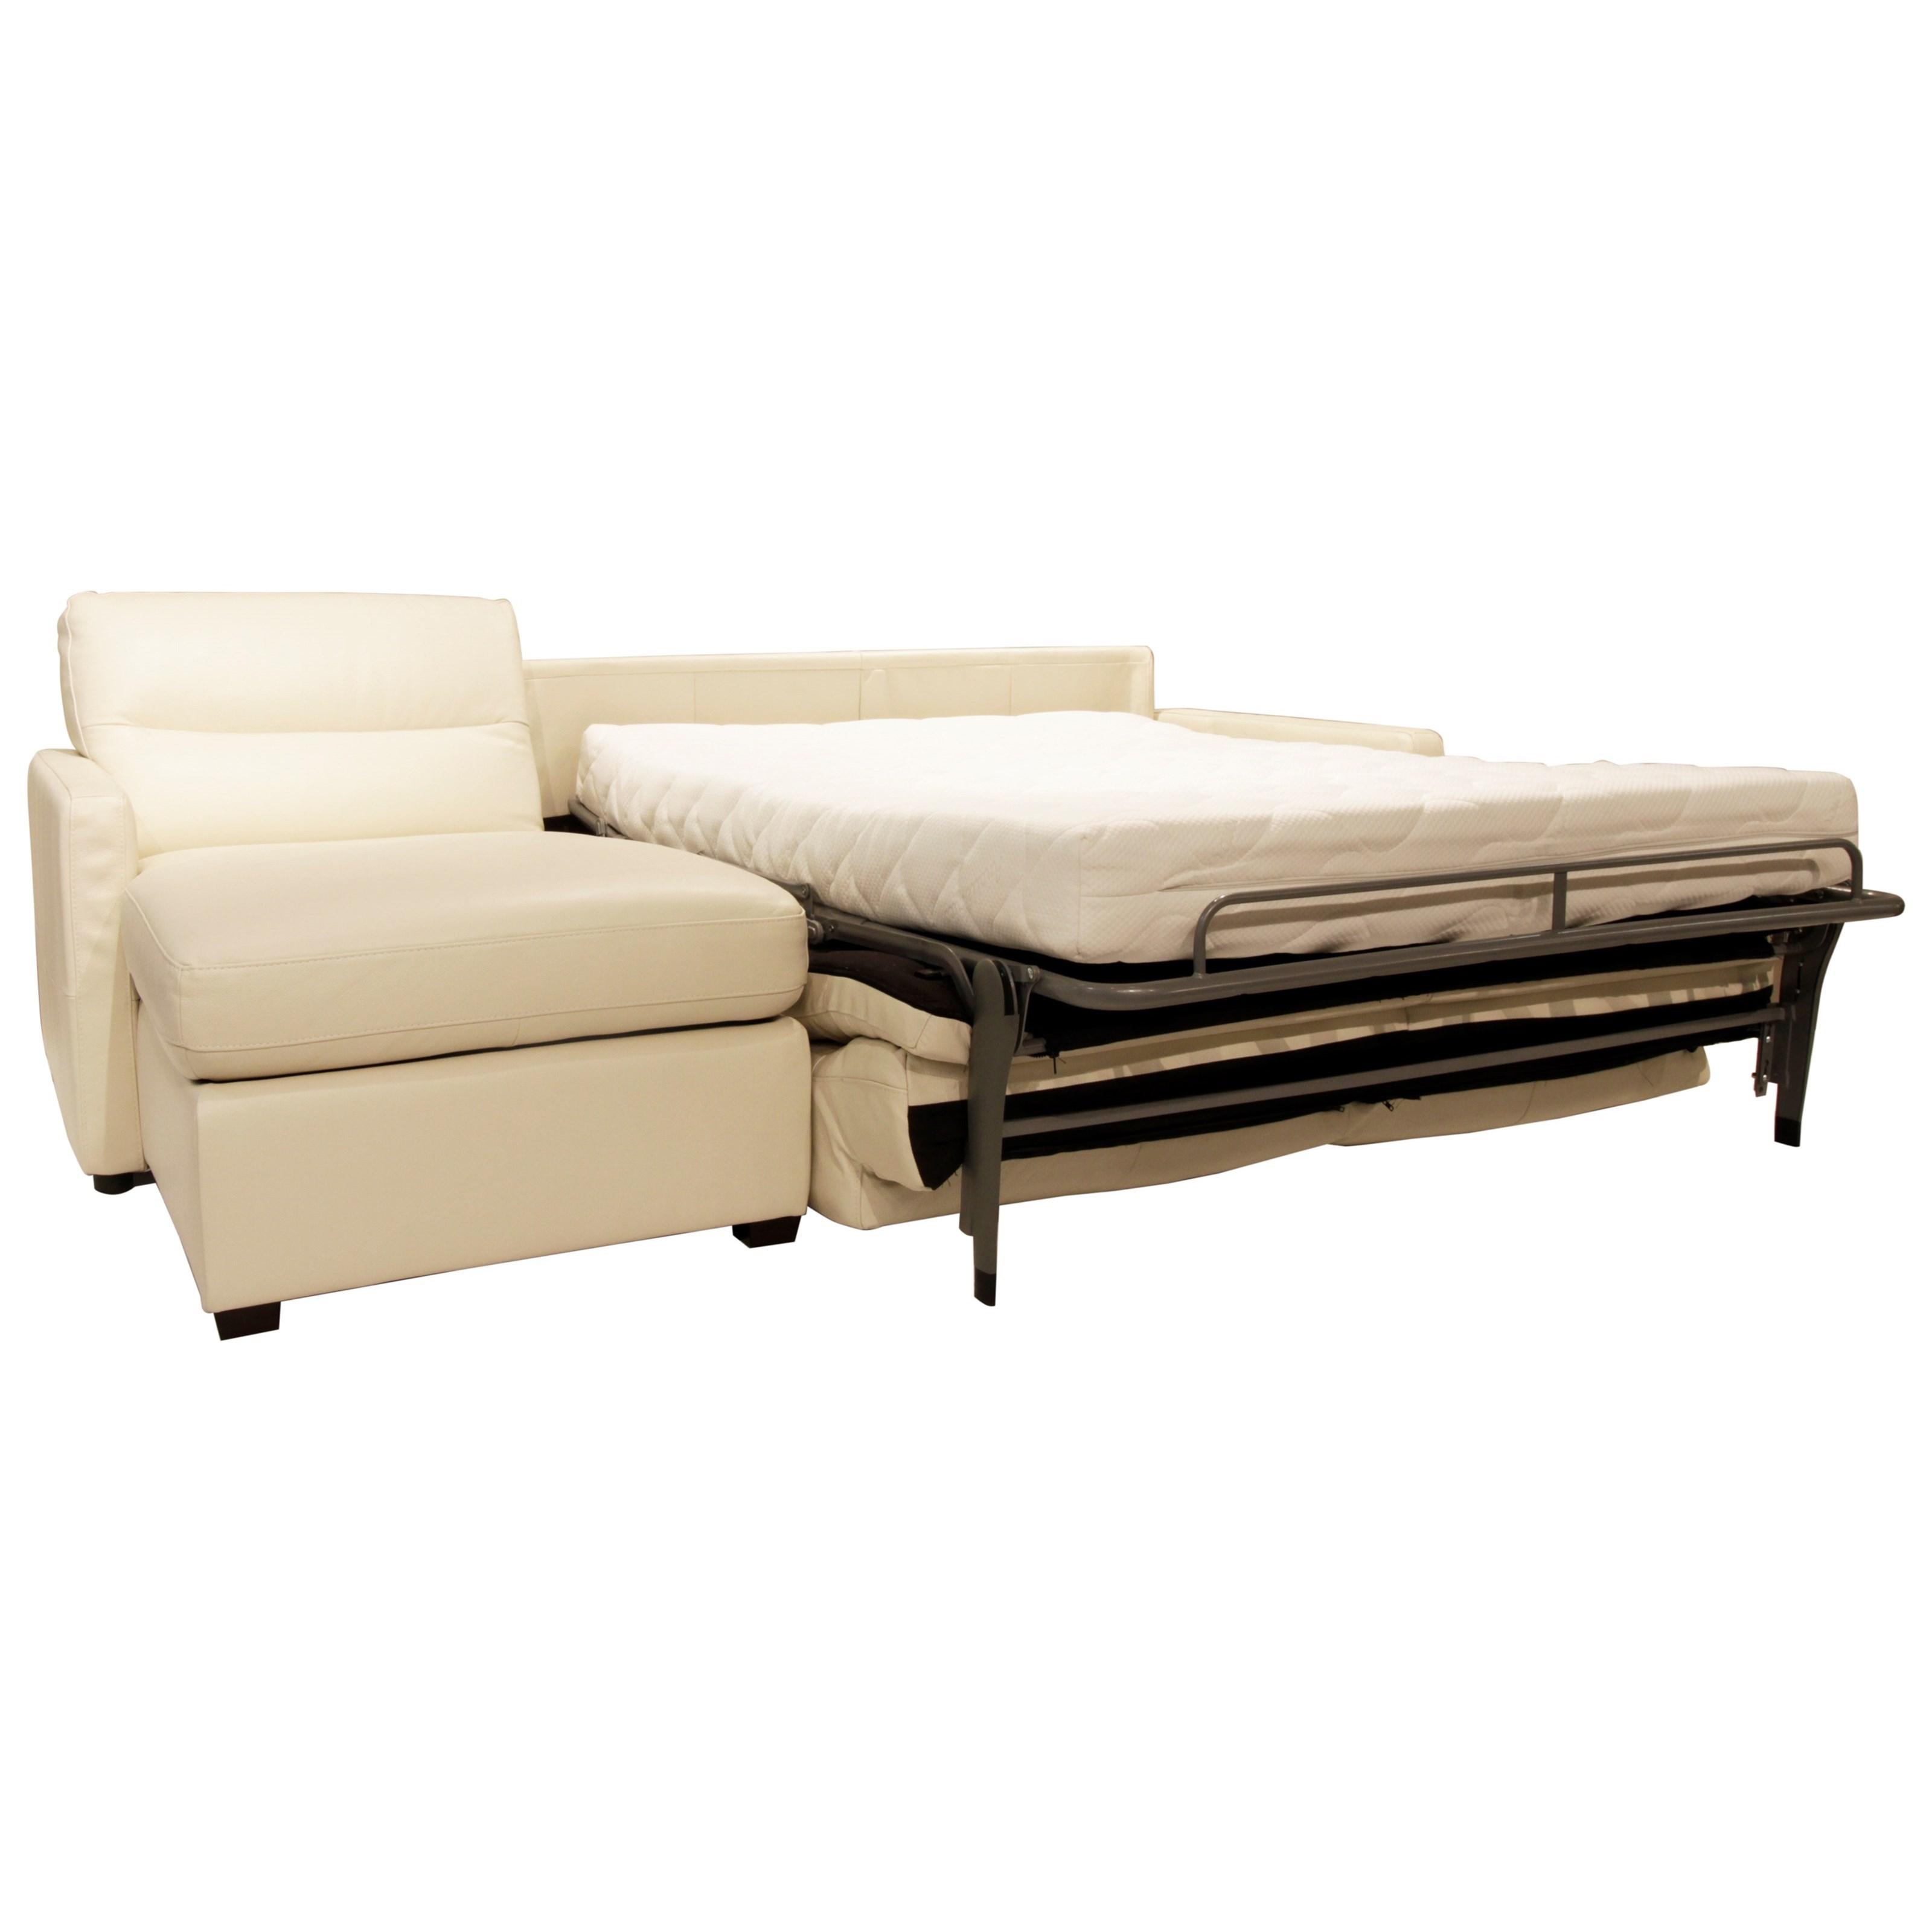 natuzzi lia fabric sleeper sofa reviews sunbrella slipcover editions garbo contemporary sectional with